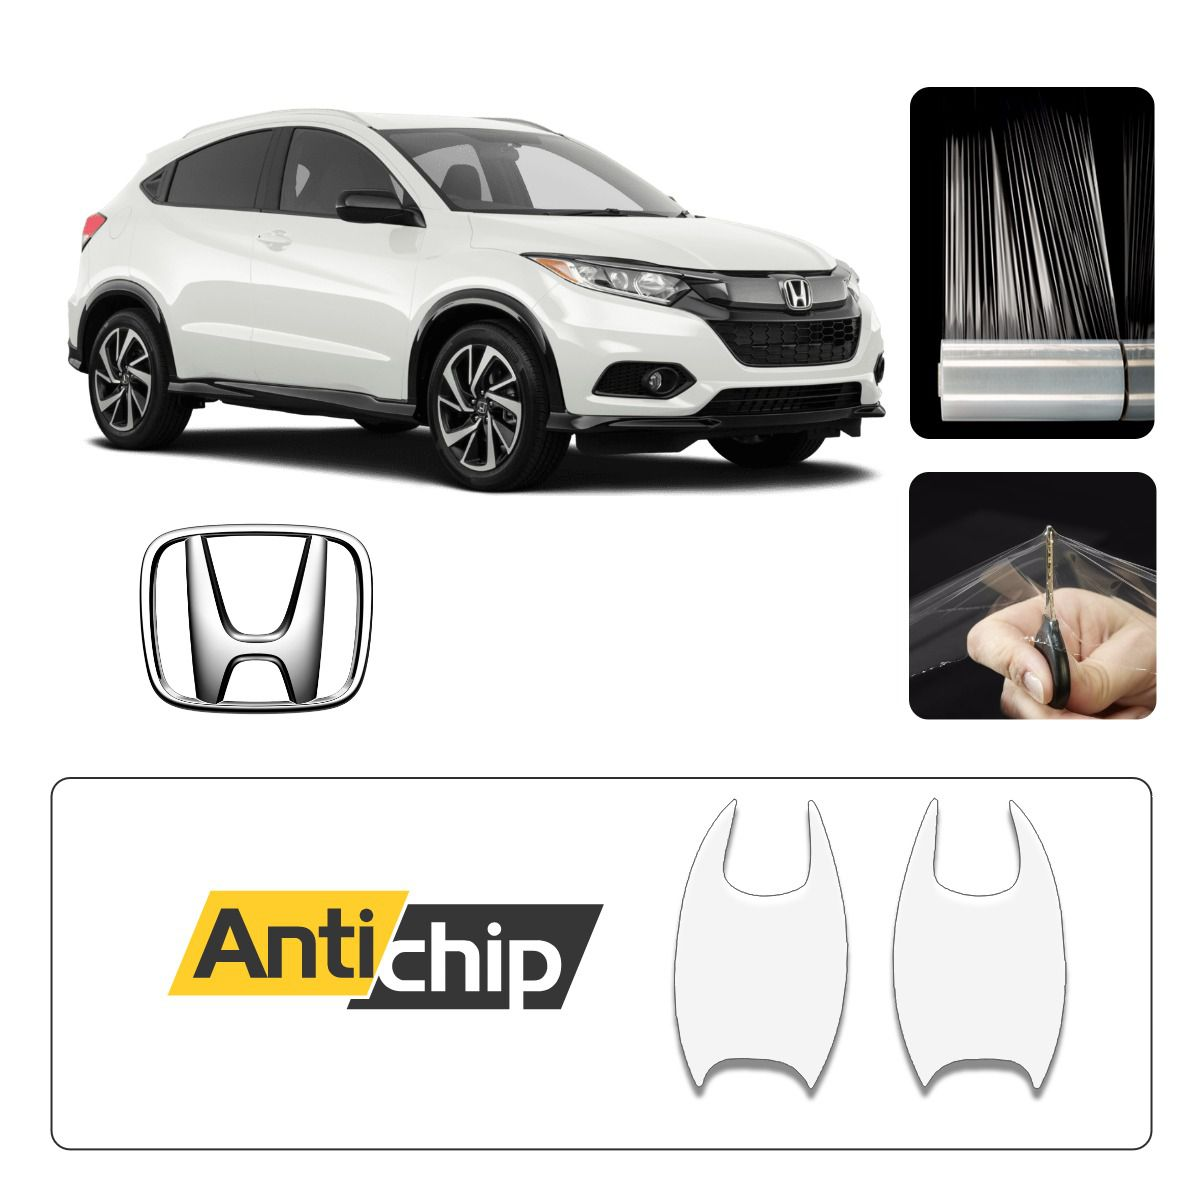 Película Protetora de Pintura Maçaneta Honda HRV - Antichip